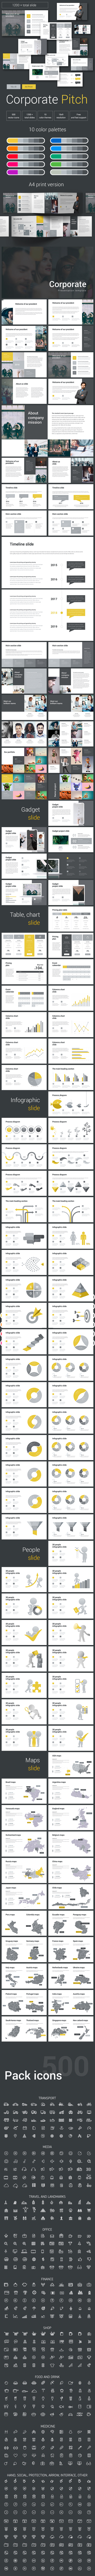 Corporate Pitch Deck Google Slide Template - Google Slides Presentation Templates